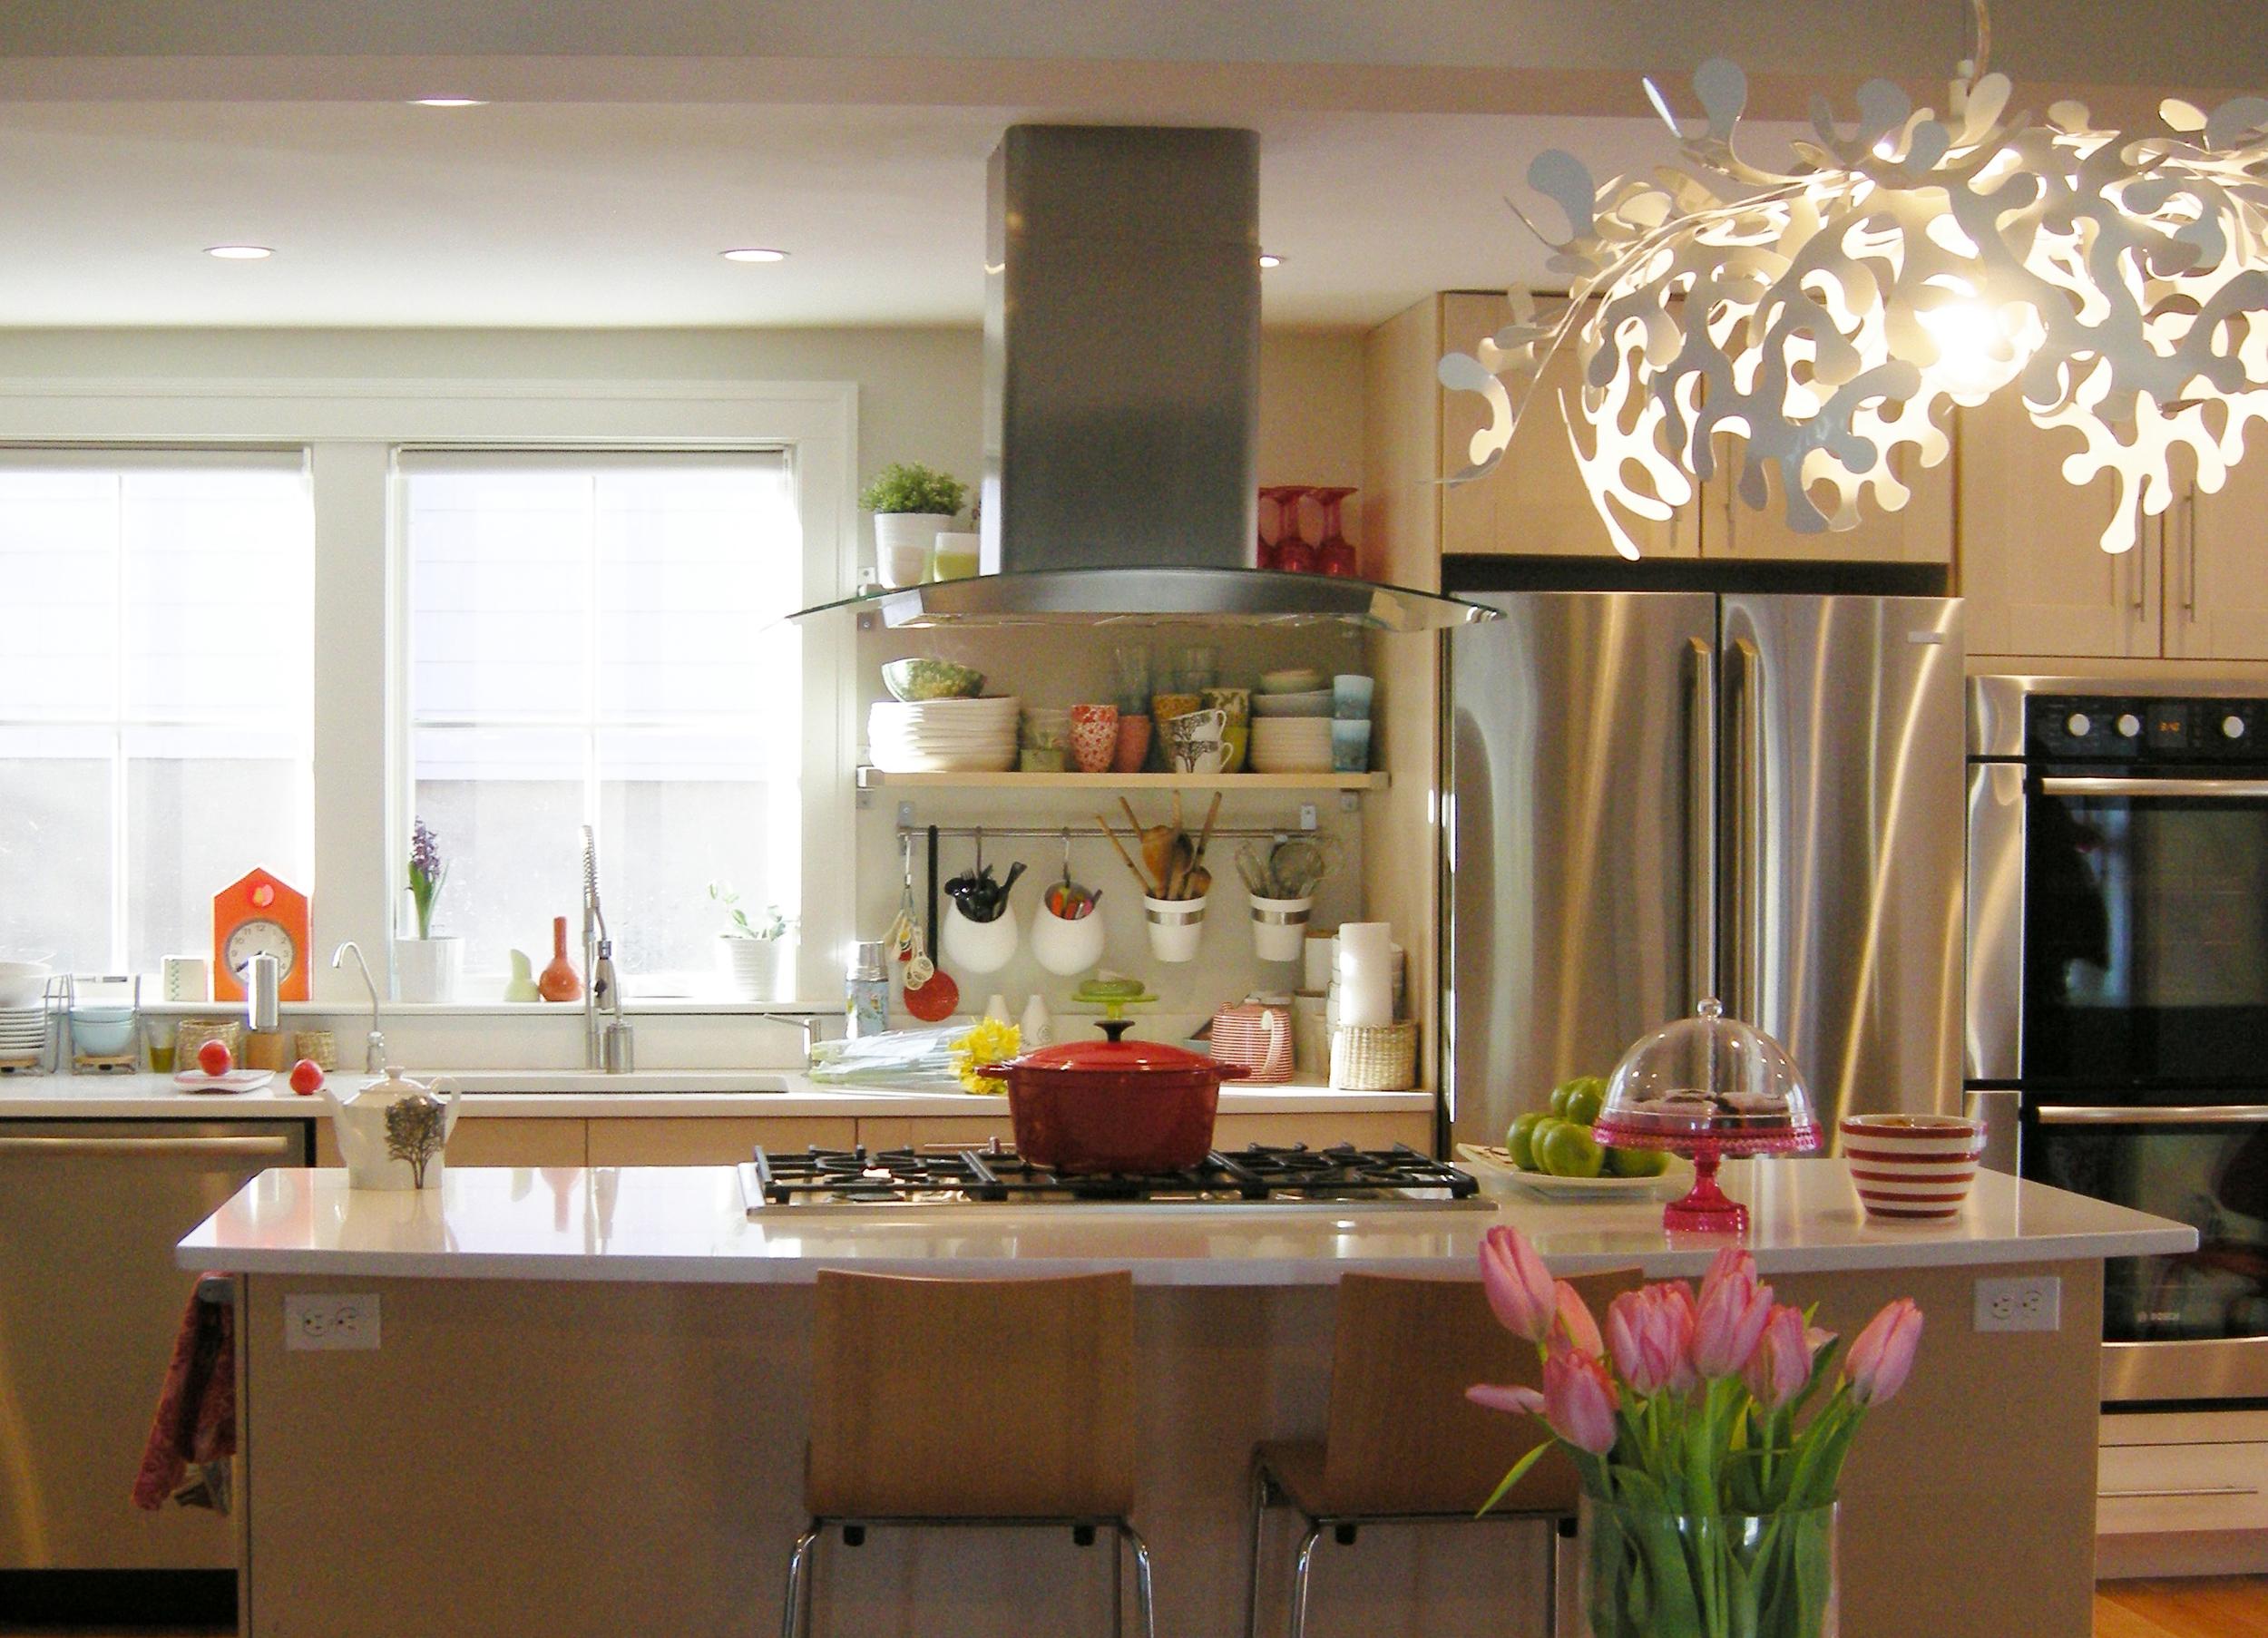 1 Arlington kitchen Feb 2011 060 cropped-2.jpg